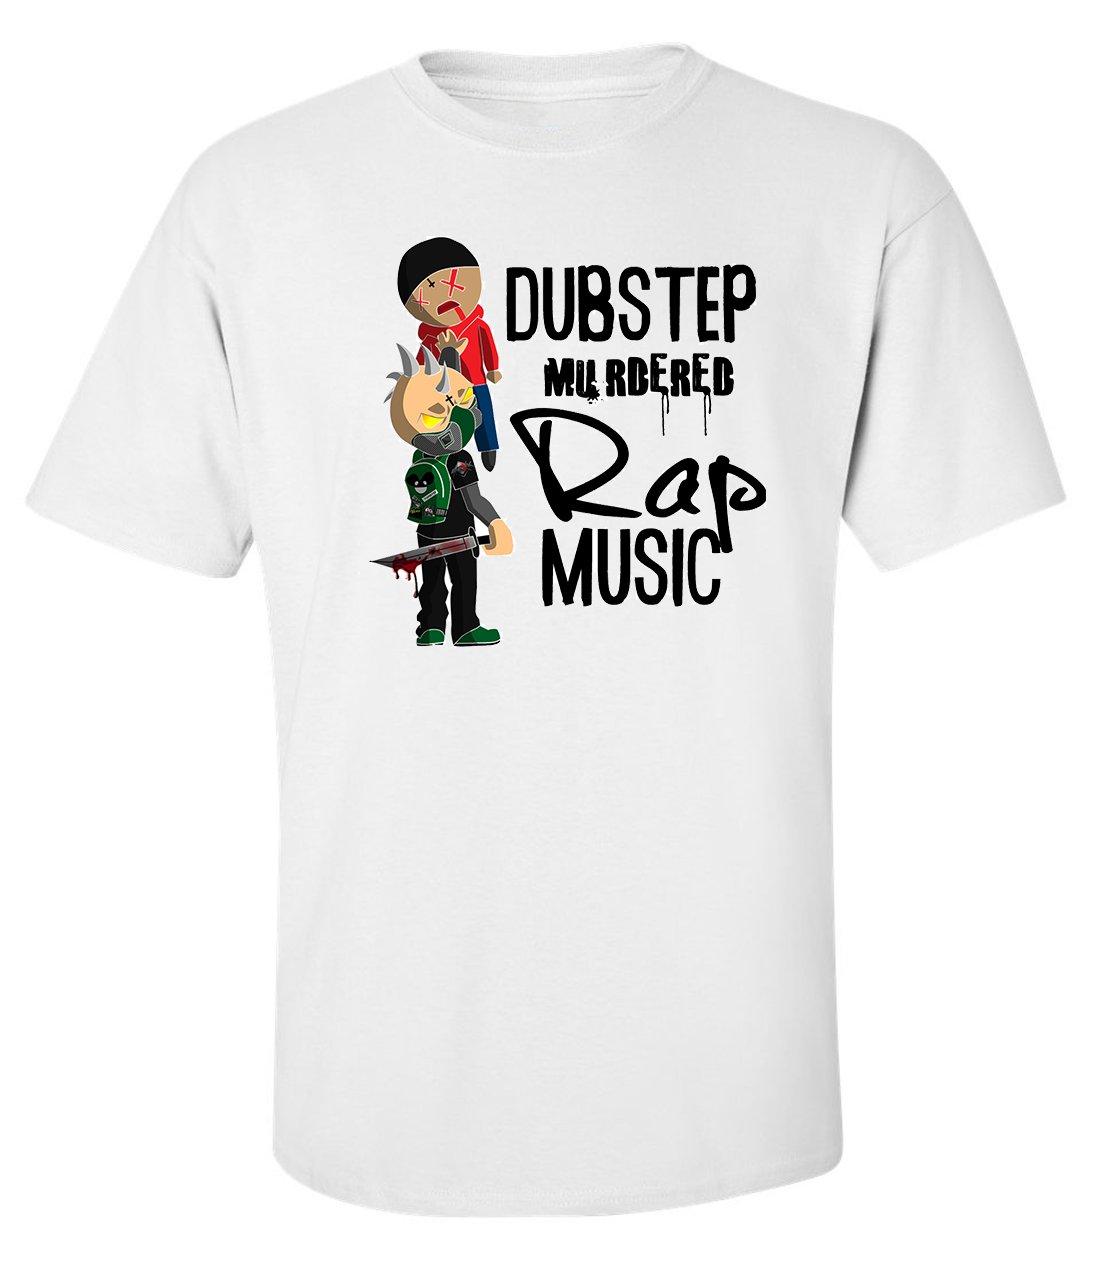 Dubstep murdered rap music men printed white cotton t-shirt size 2XL